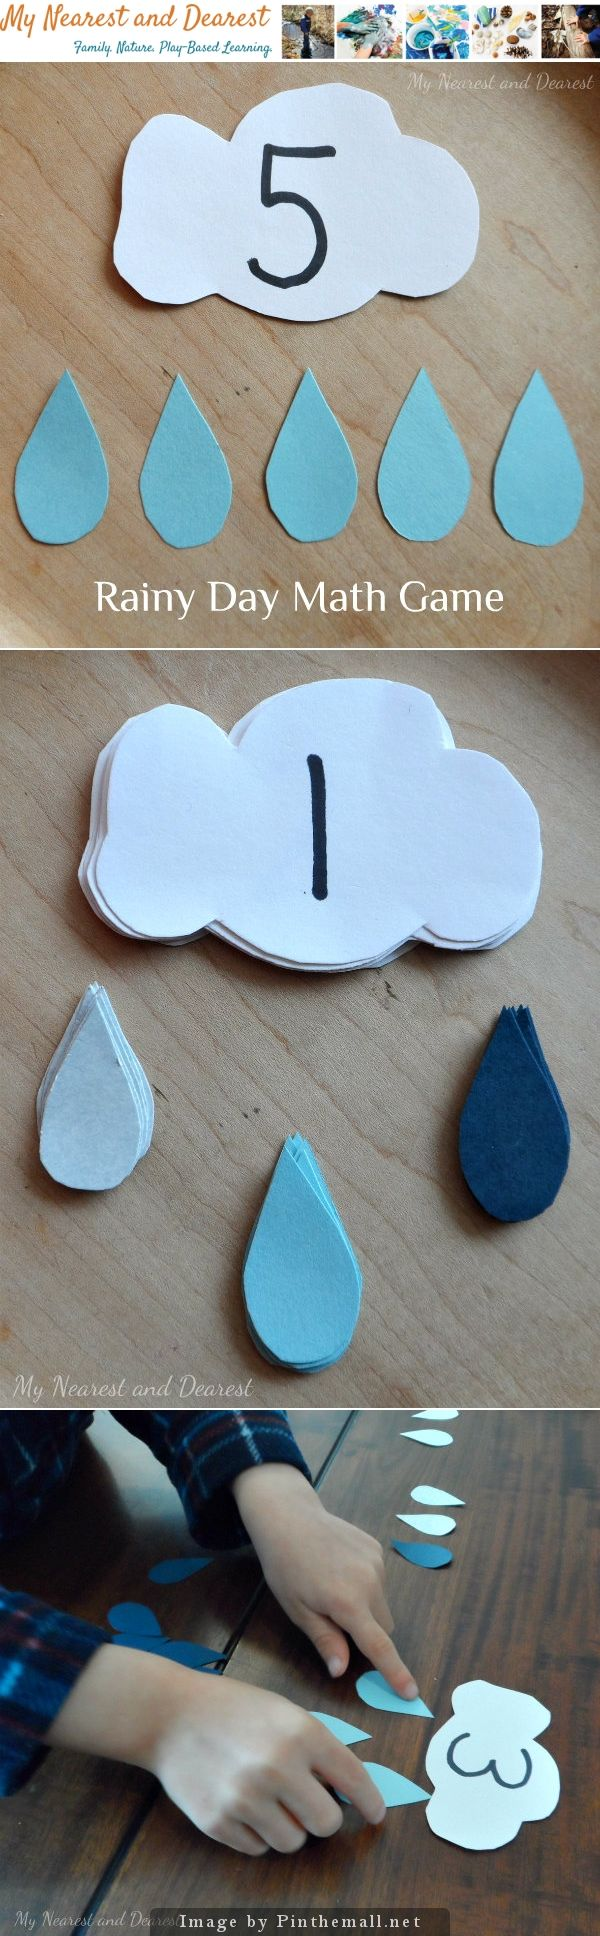 Rainy Day Math Games – This